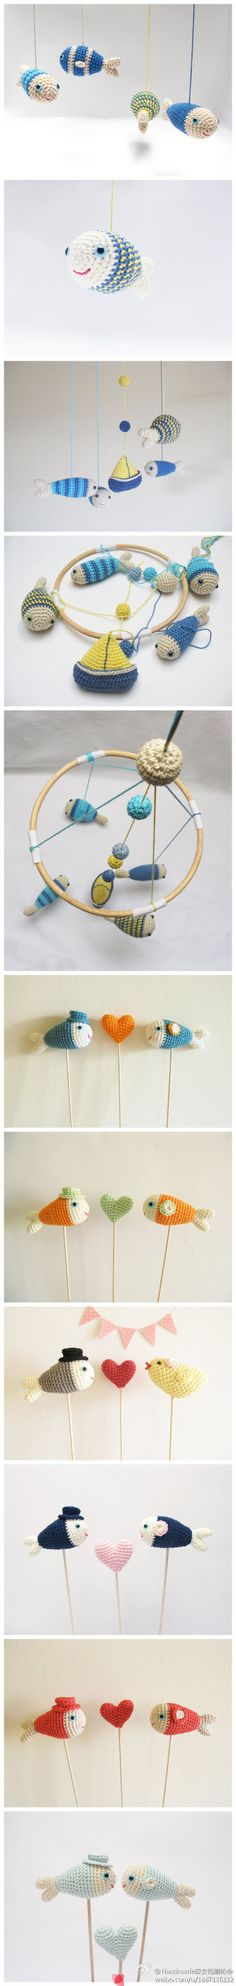 Pececillos de ganchillo. Little fishes crochet.